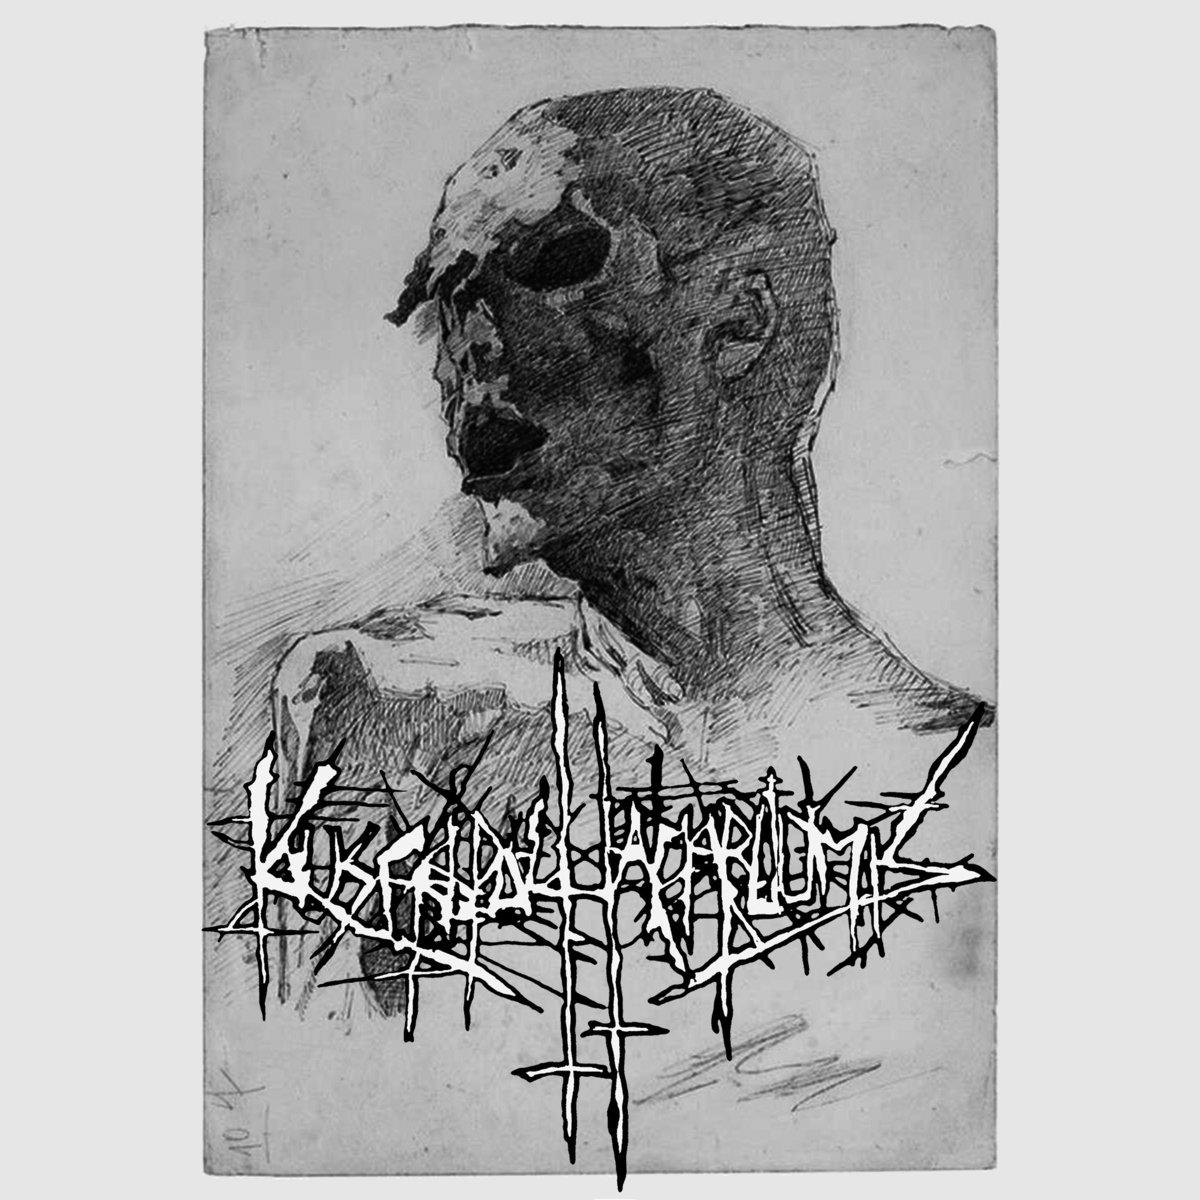 KUSENPOLTTAMARUUMIS - III cover